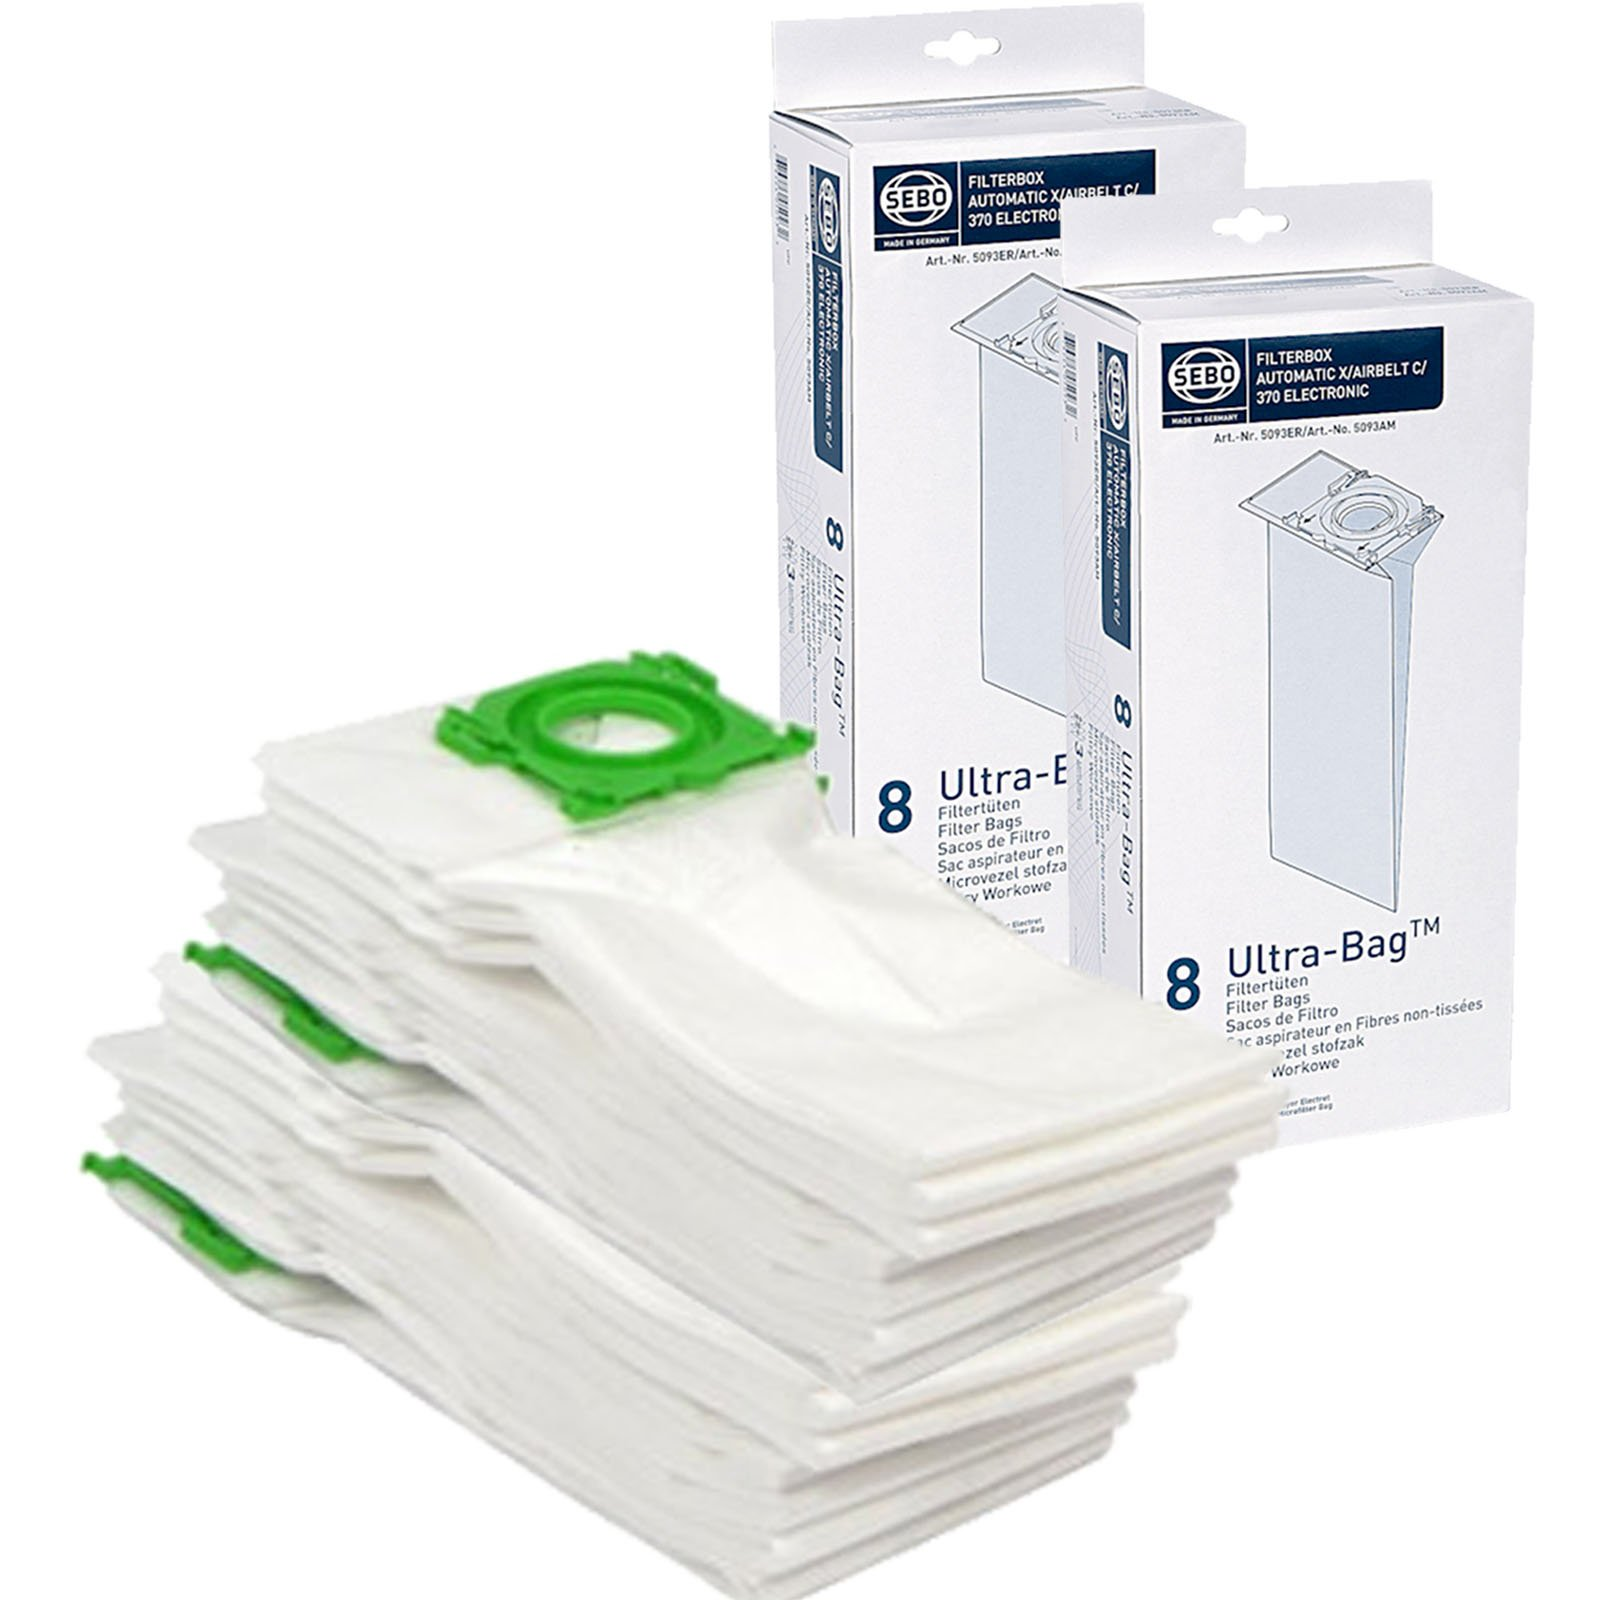 SEBO X1 X2 X3 X4 X5 Extra Pet XP2 XP3 5093ER Vacuum Cleaner Dust Bags Pack Of 16